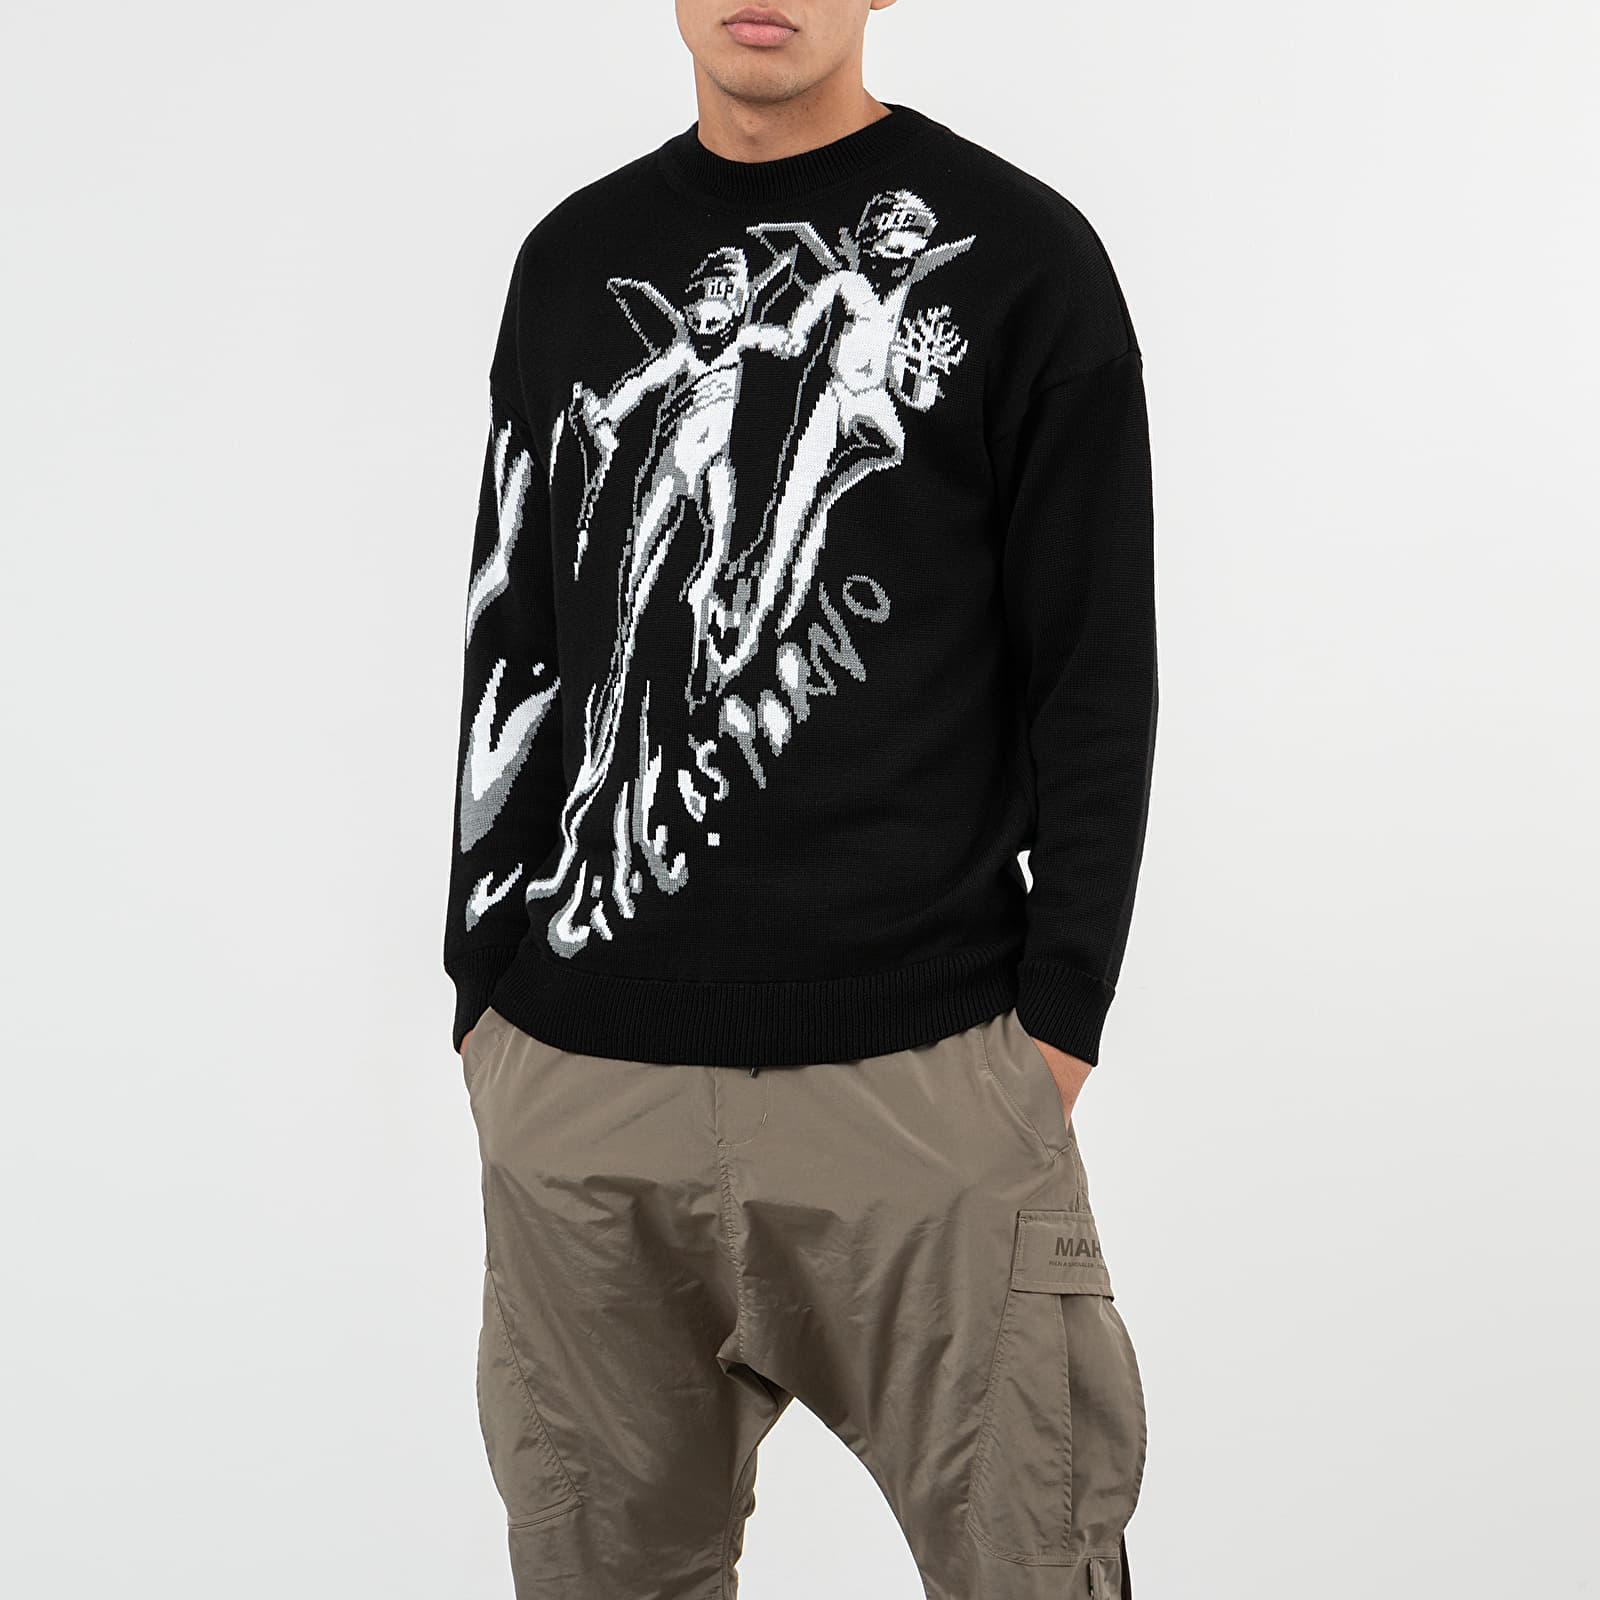 LIFE IS PORNO xxx Footshop Sweater